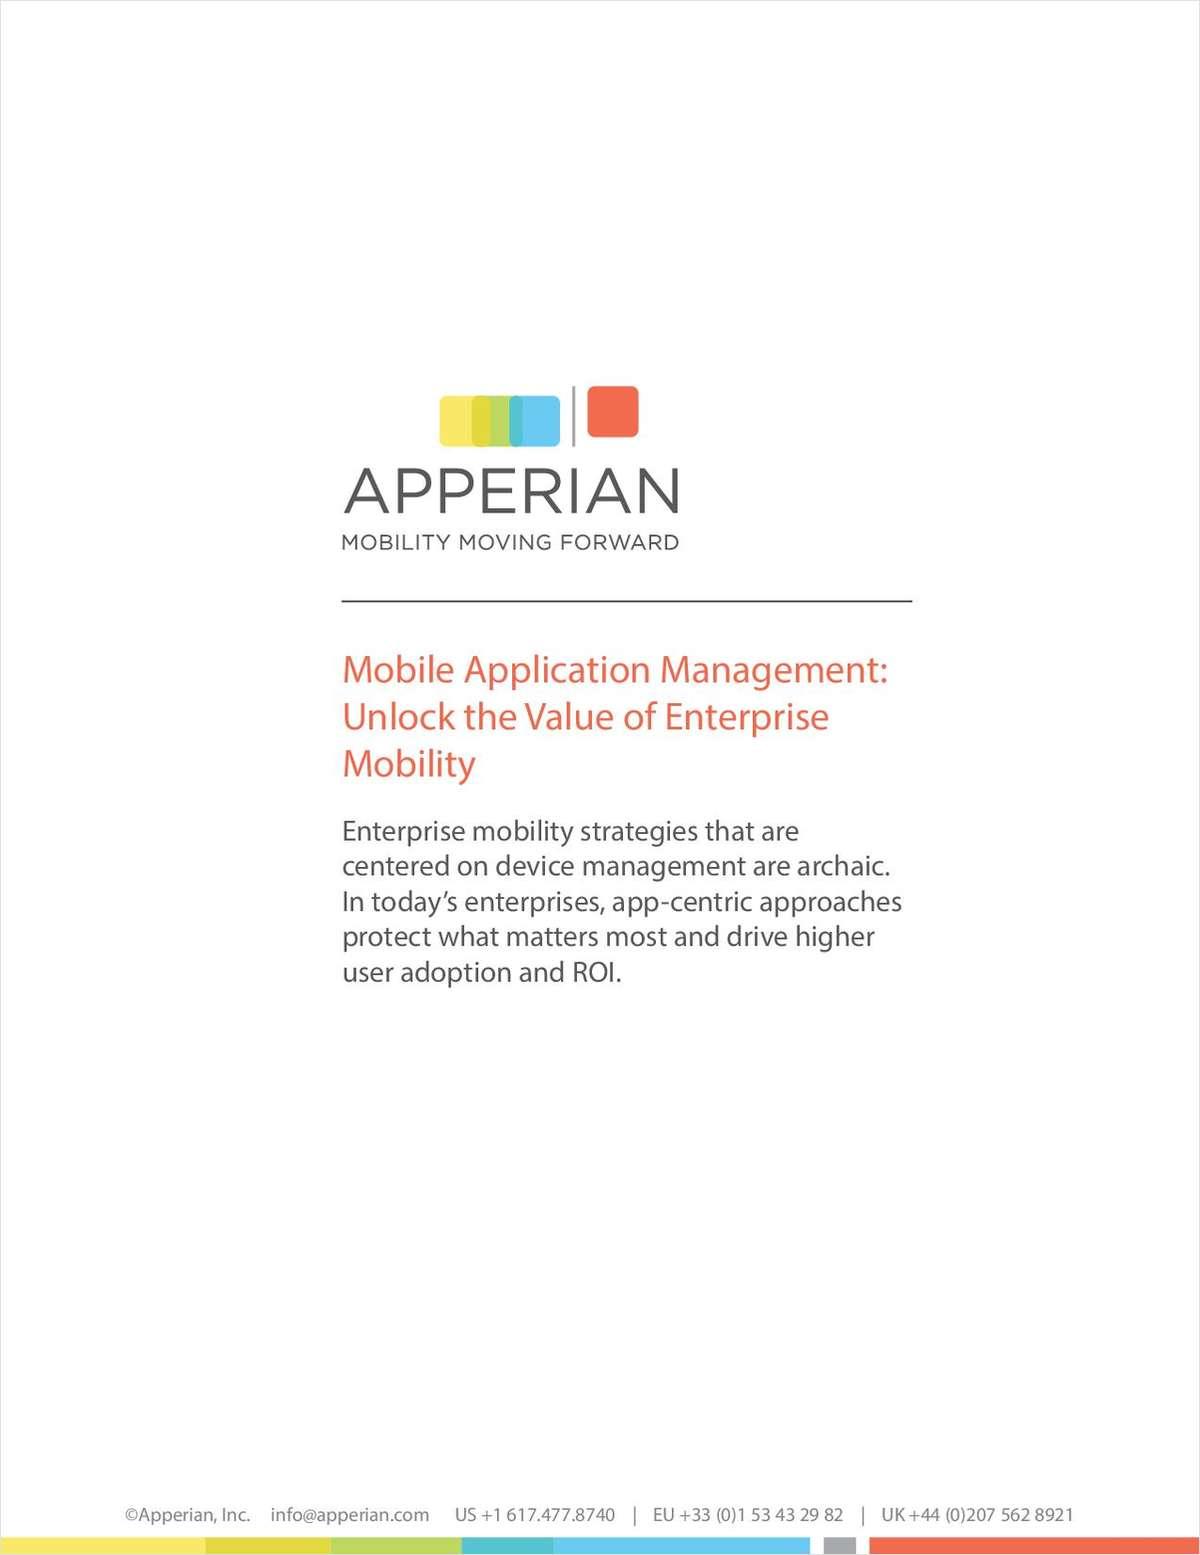 Unlock the Value of Enterprise Mobility